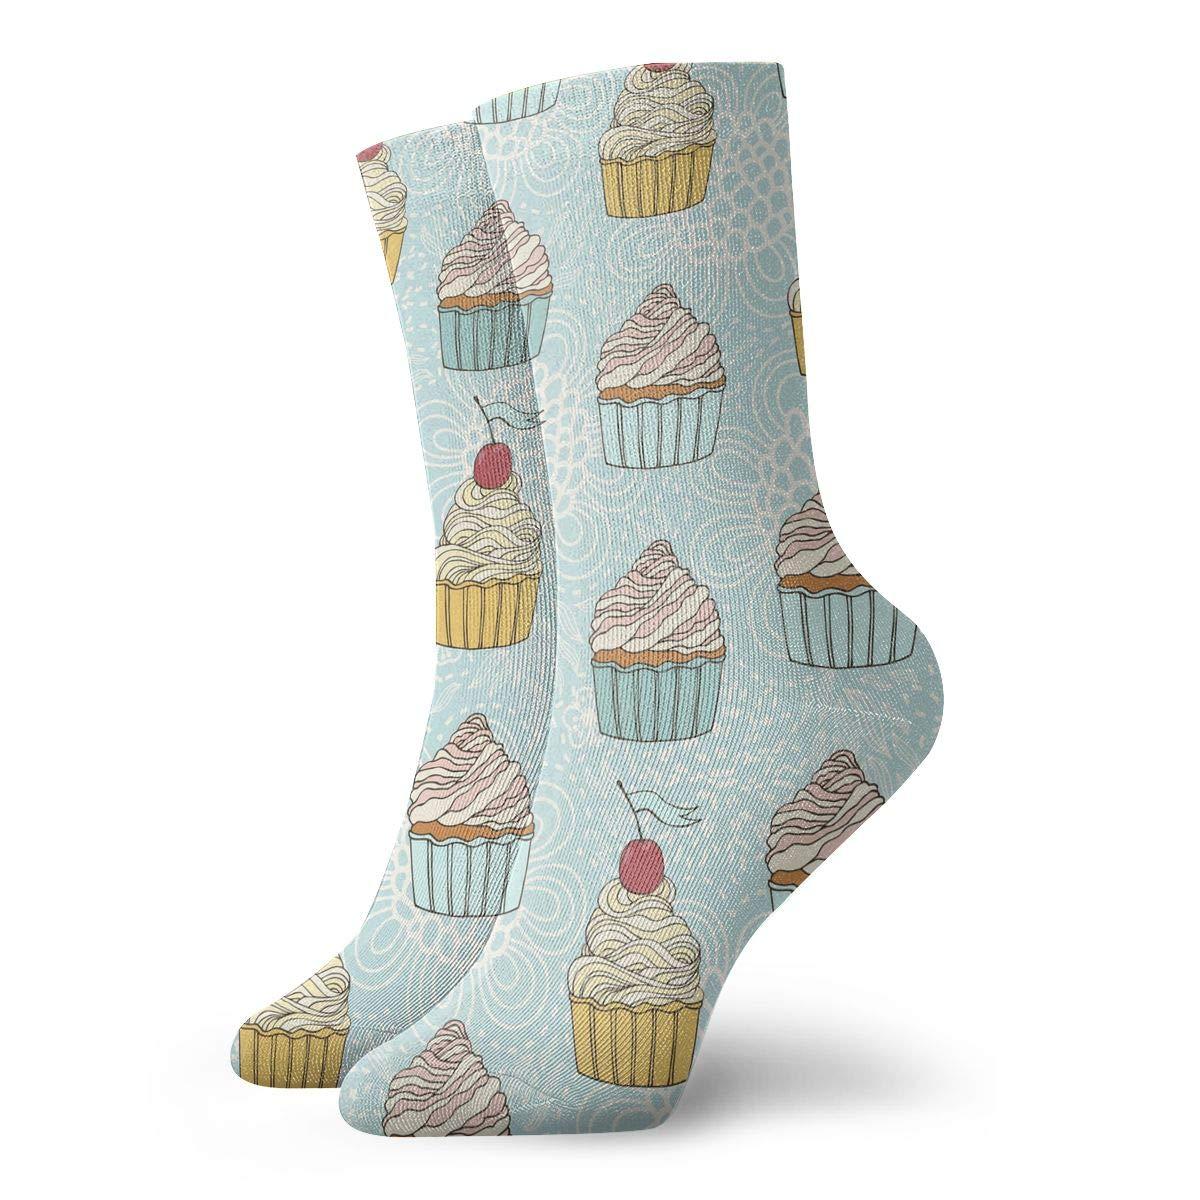 Delicious Aqua Flower Cherry Cake Fashion Dress Socks Short Socks Leisure Travel 11.8 Inch